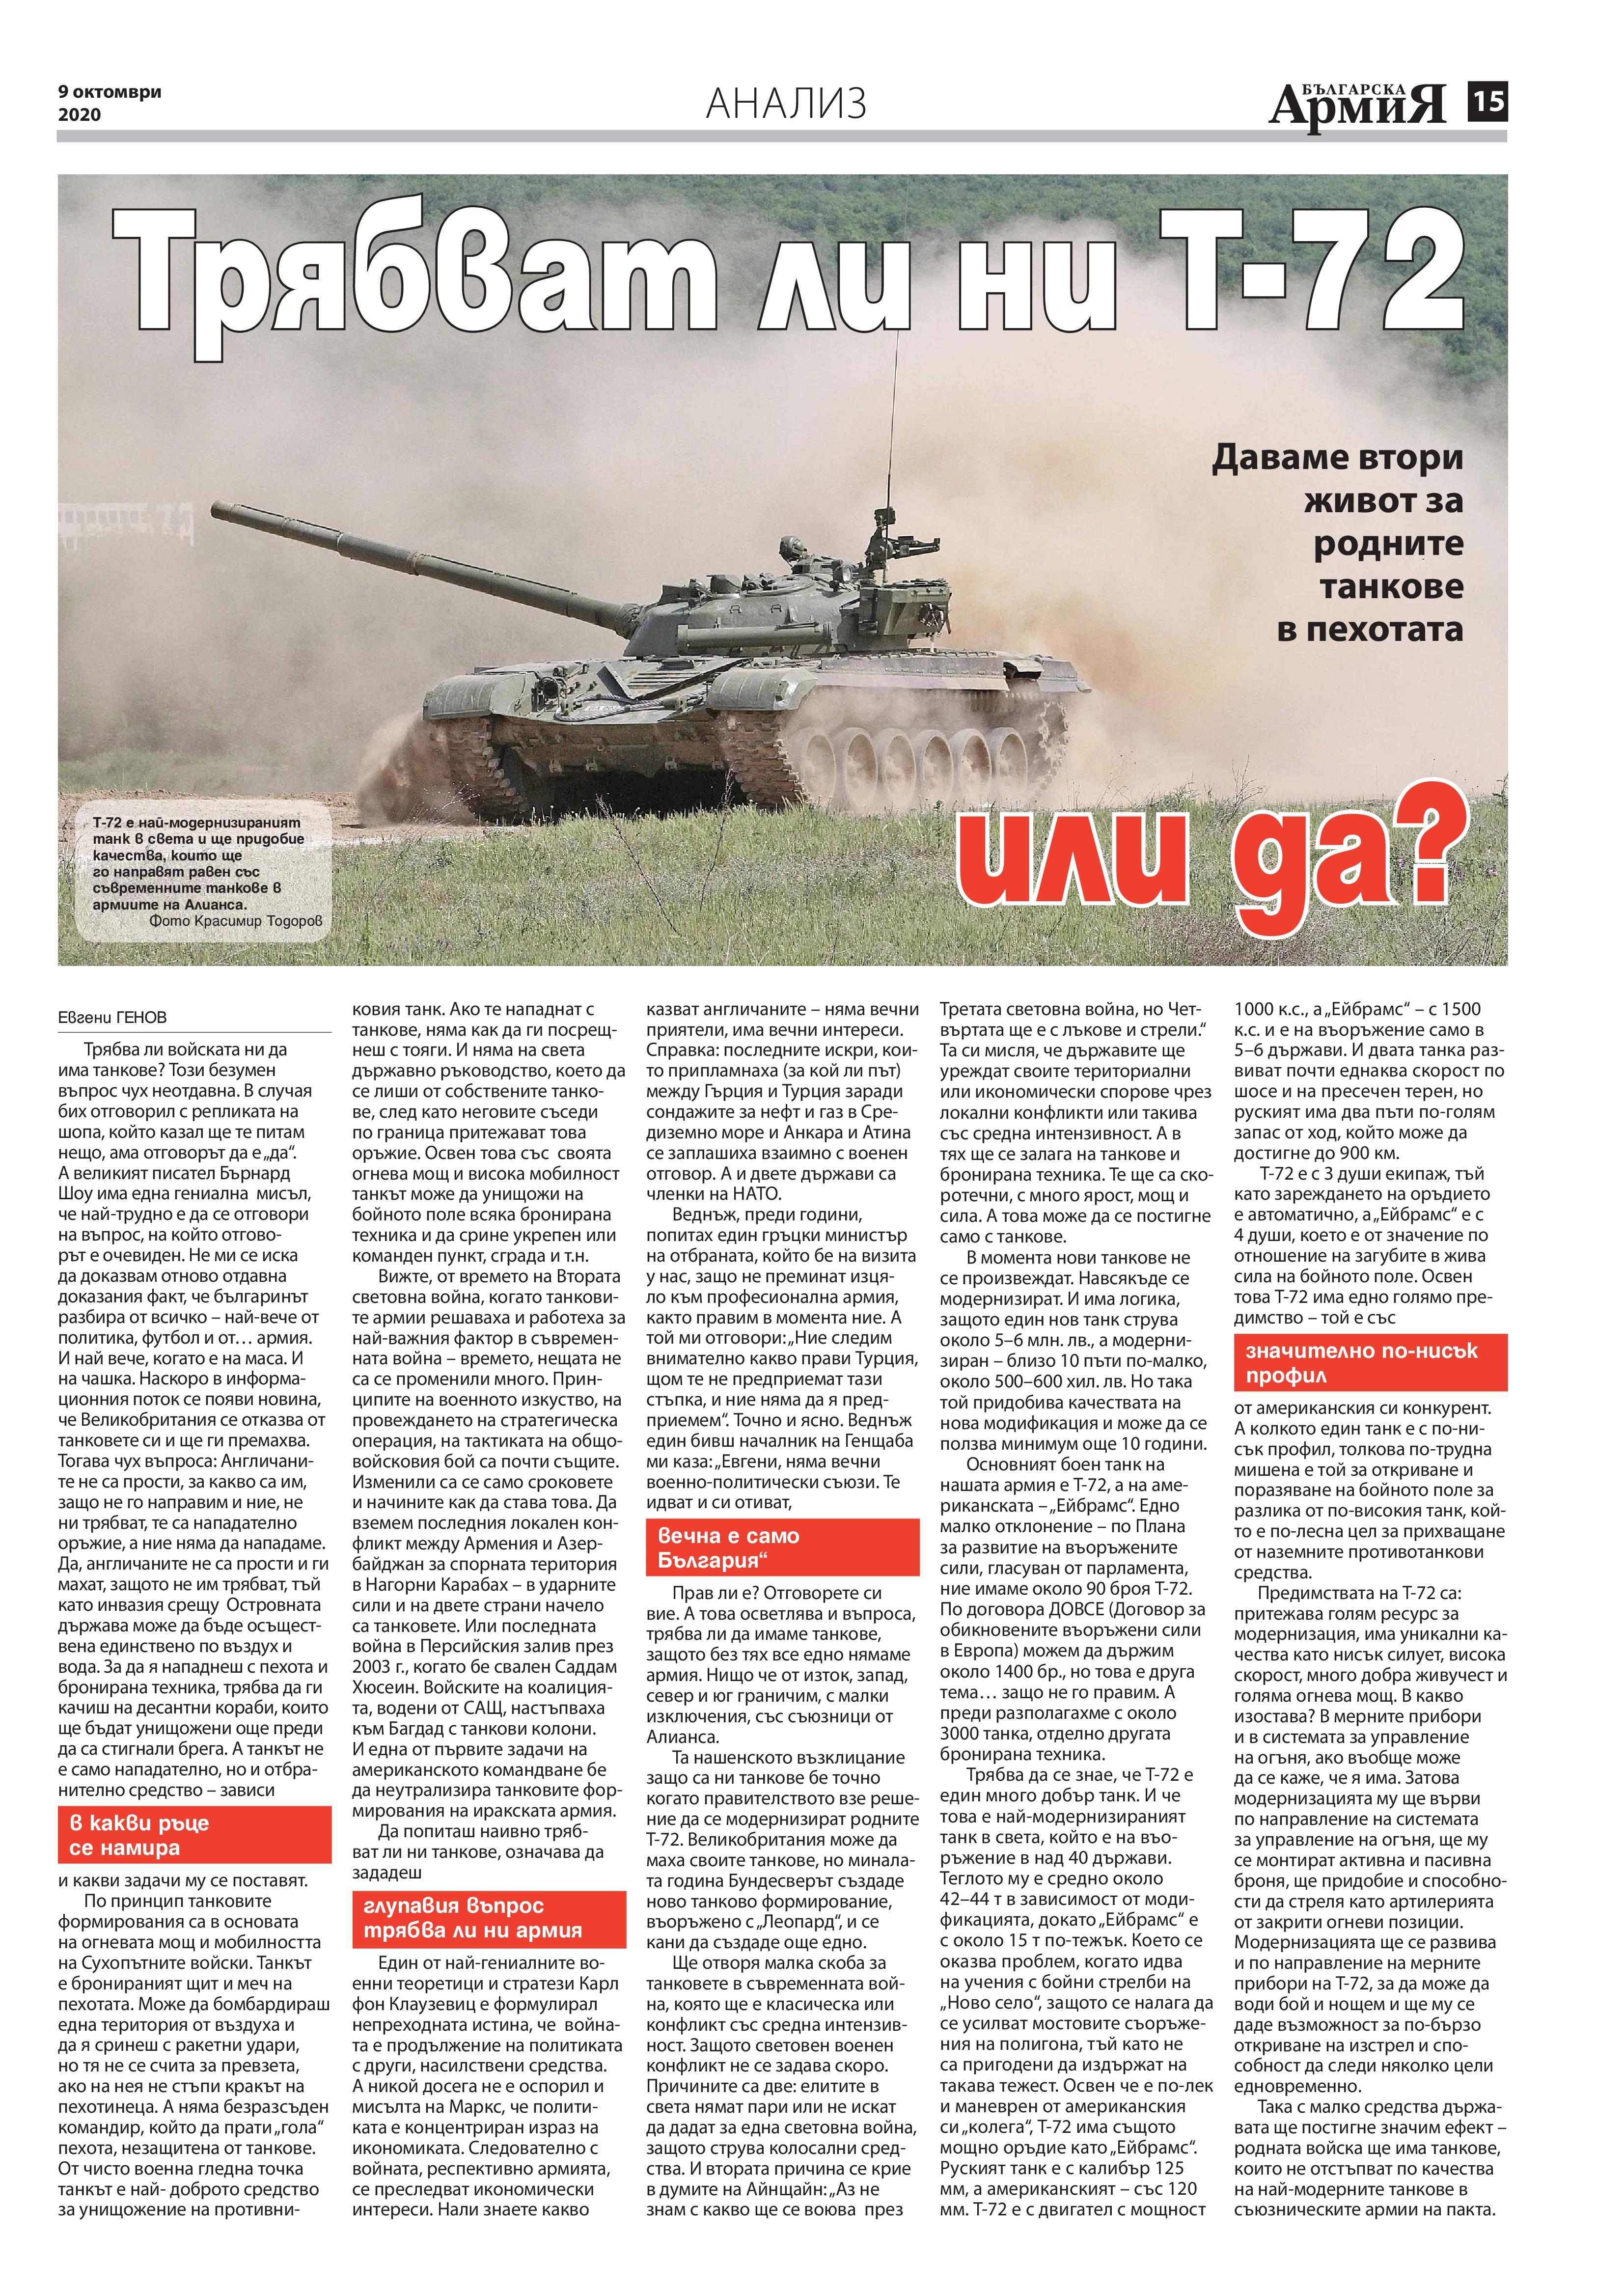 https://armymedia.bg/wp-content/uploads/2015/06/15-43.jpg